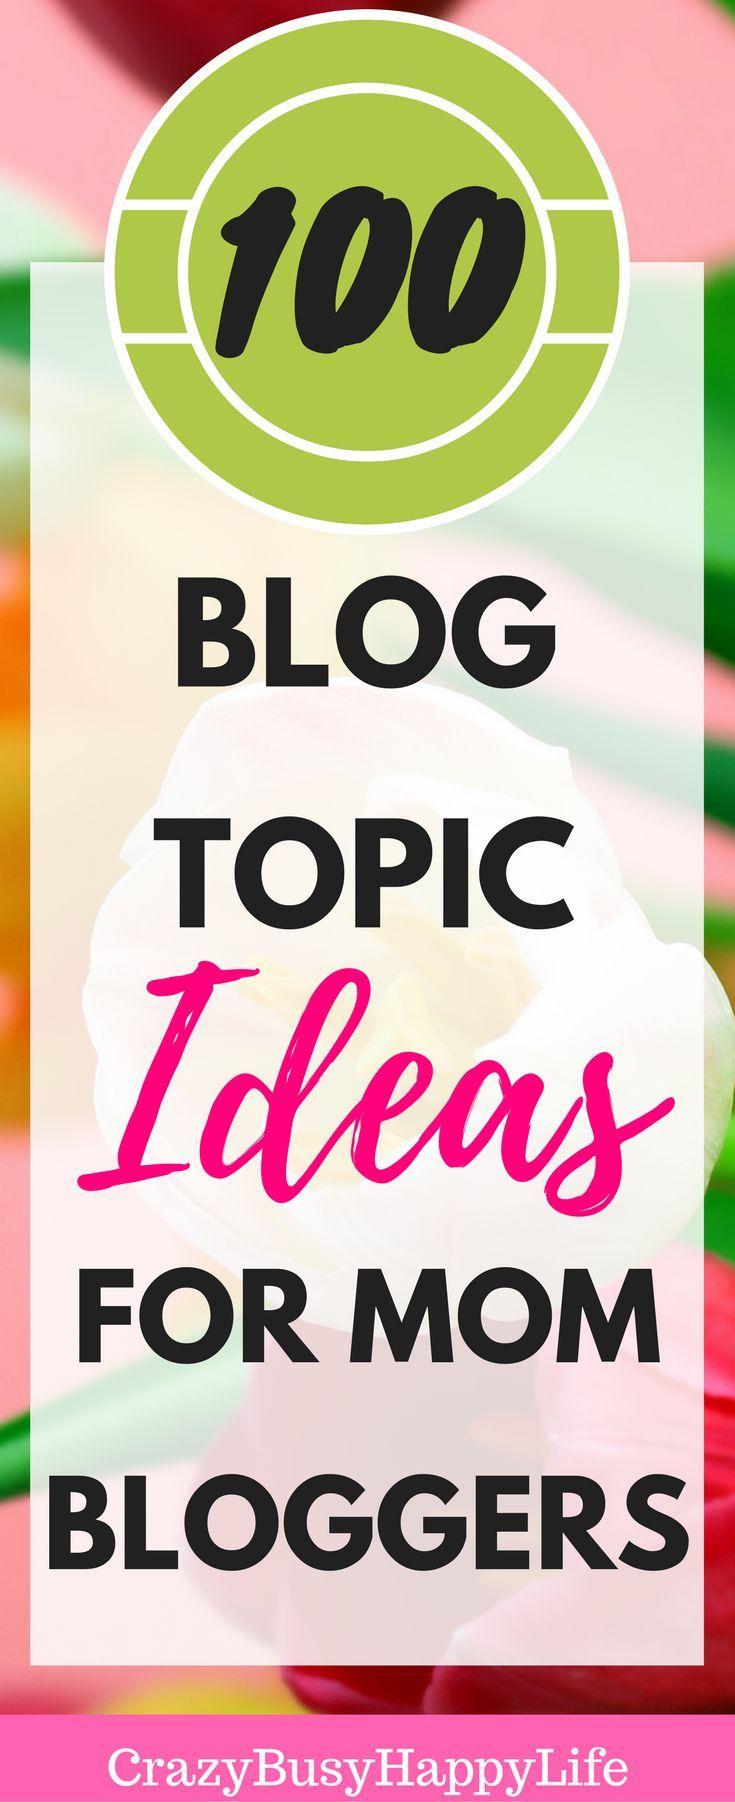 HUGE List of 100 Blog Topics For Mom Bloggers